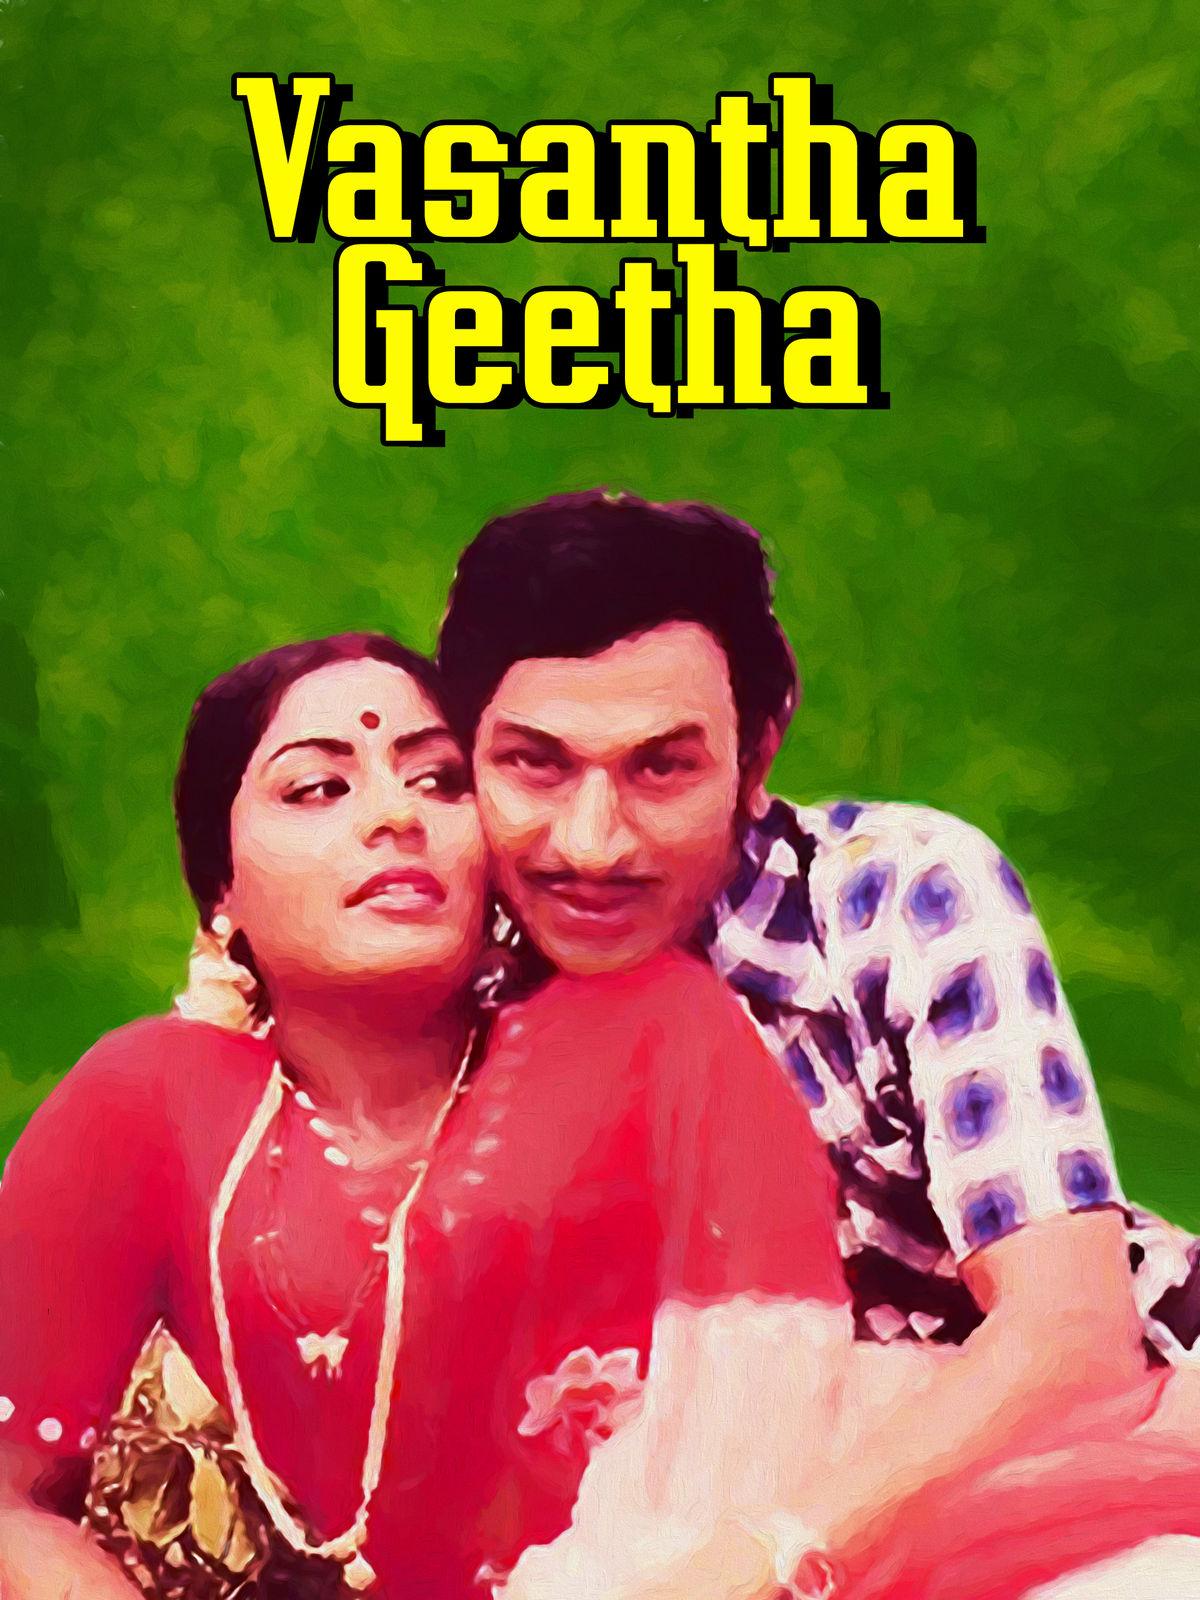 Vasantha Geetha